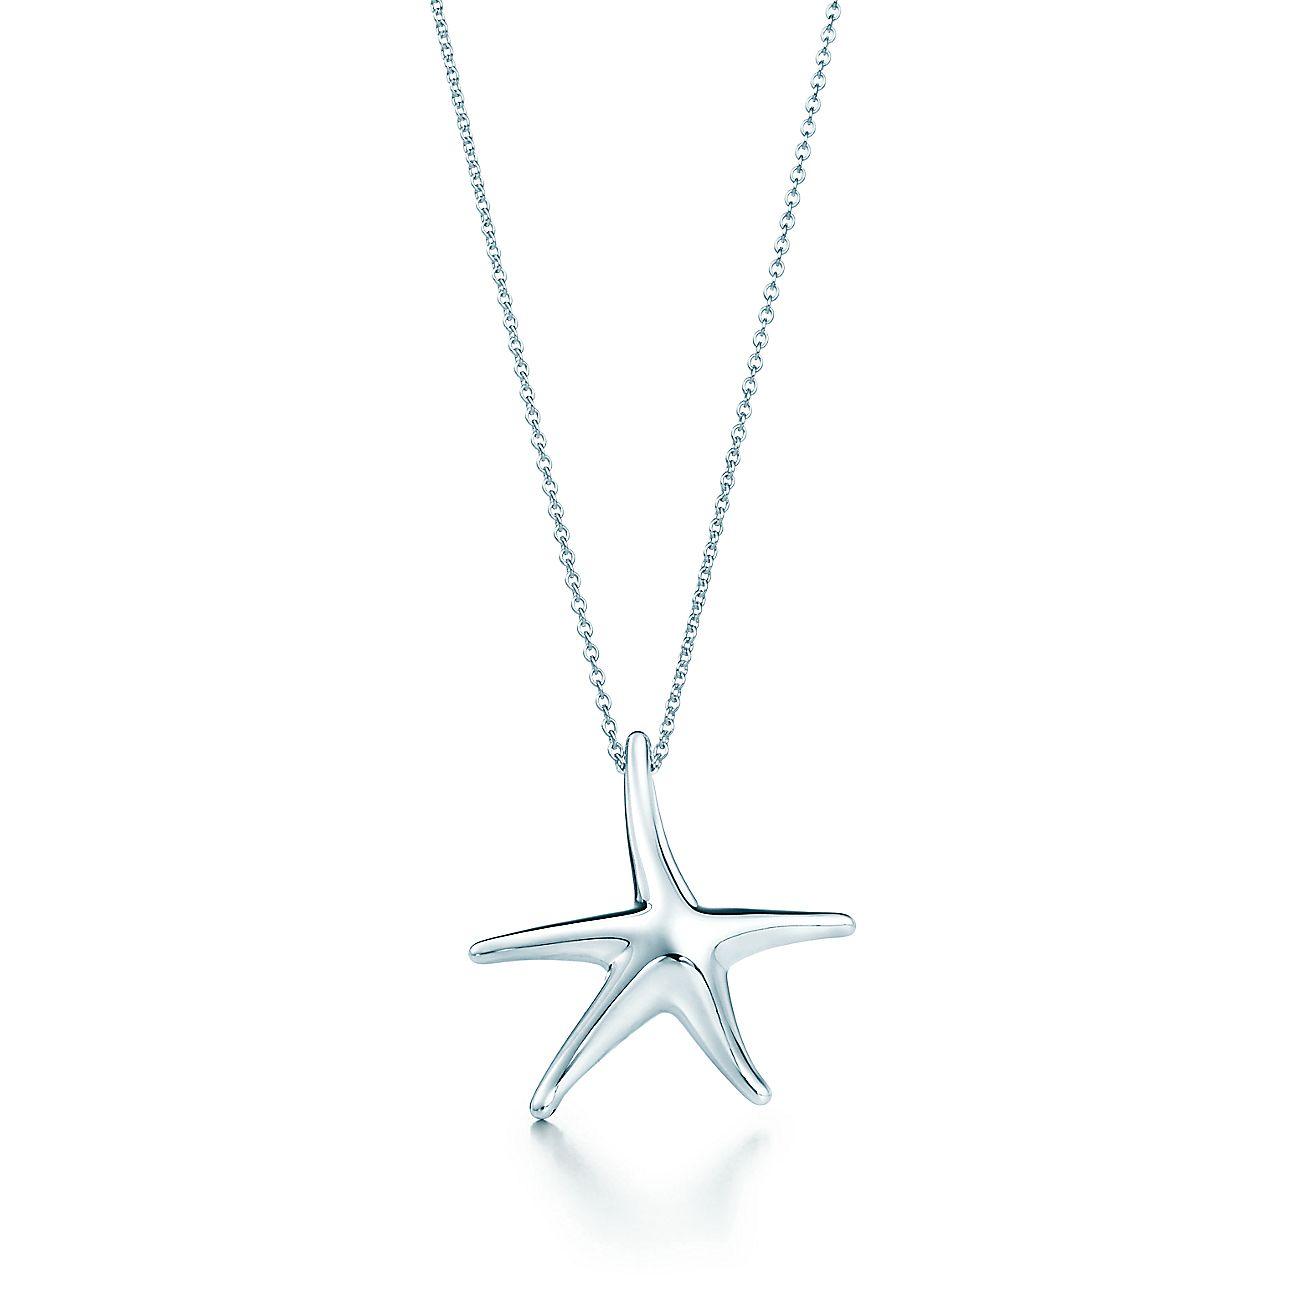 Elsa peretti starfish pendant in sterling silver 28 mm tiffany elsa peretti starfish pendant in sterling silver 28 mm tiffany co aloadofball Choice Image